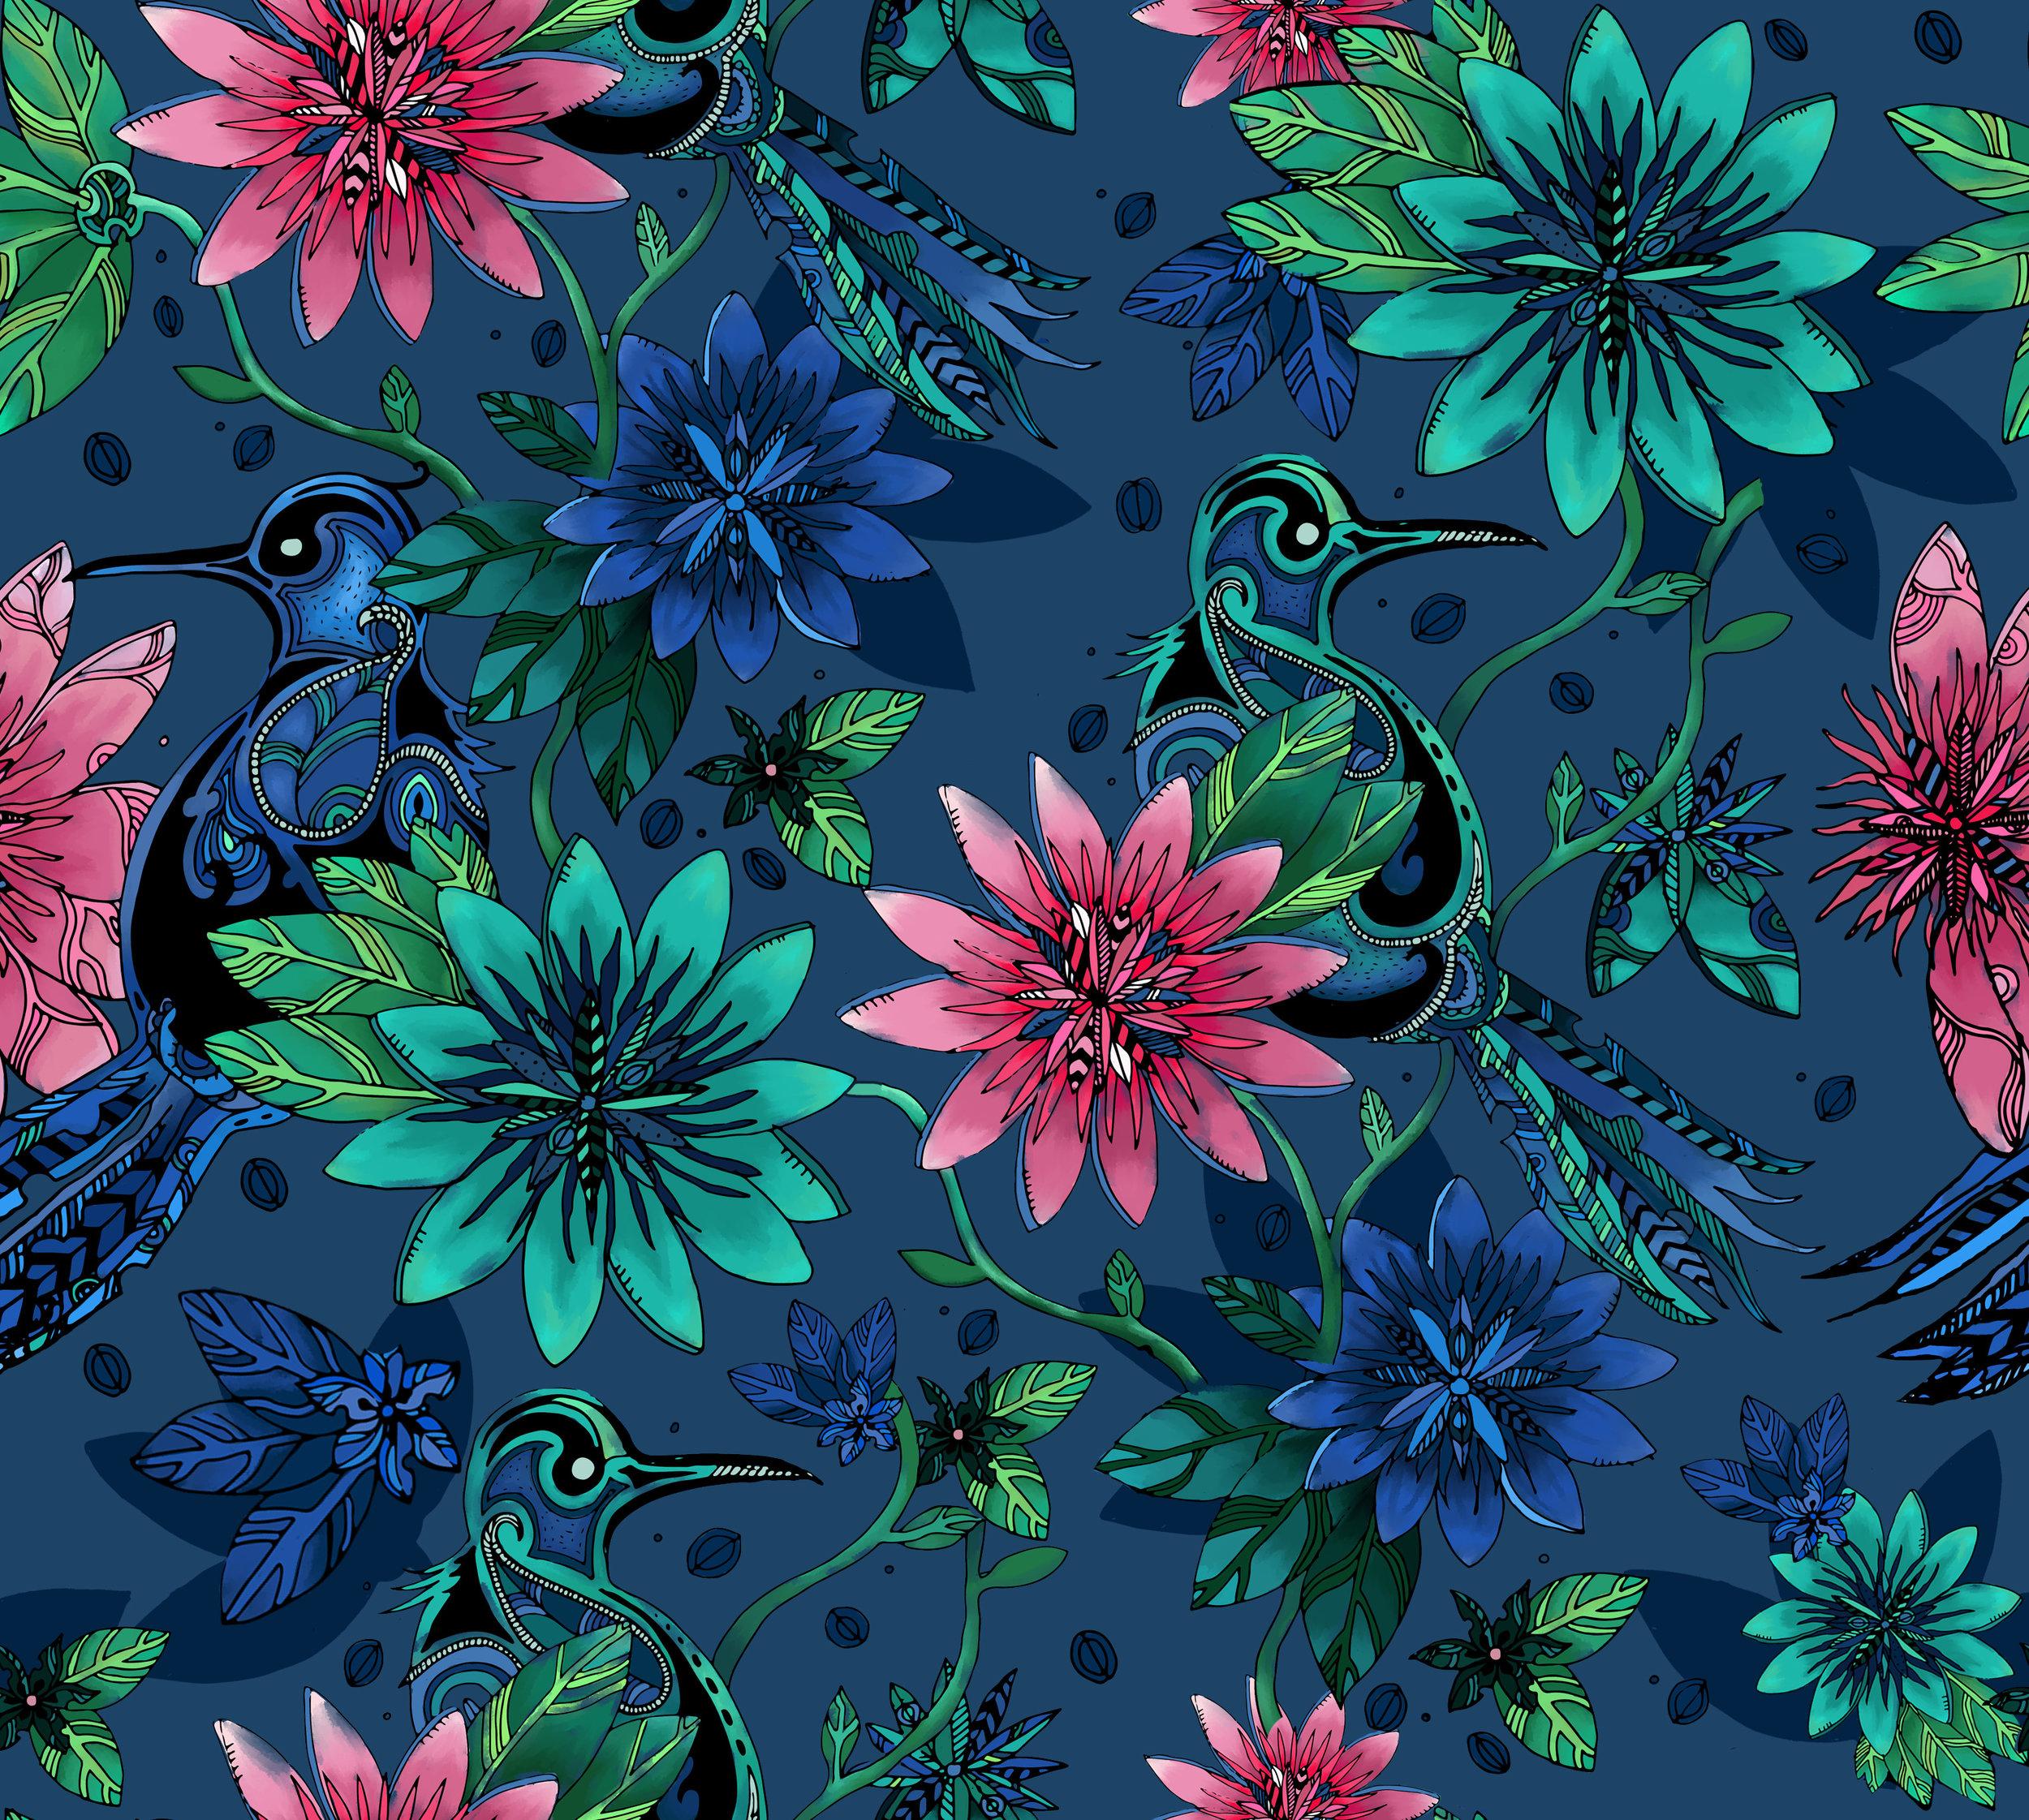 birdsandbloomsrepeat.jpg